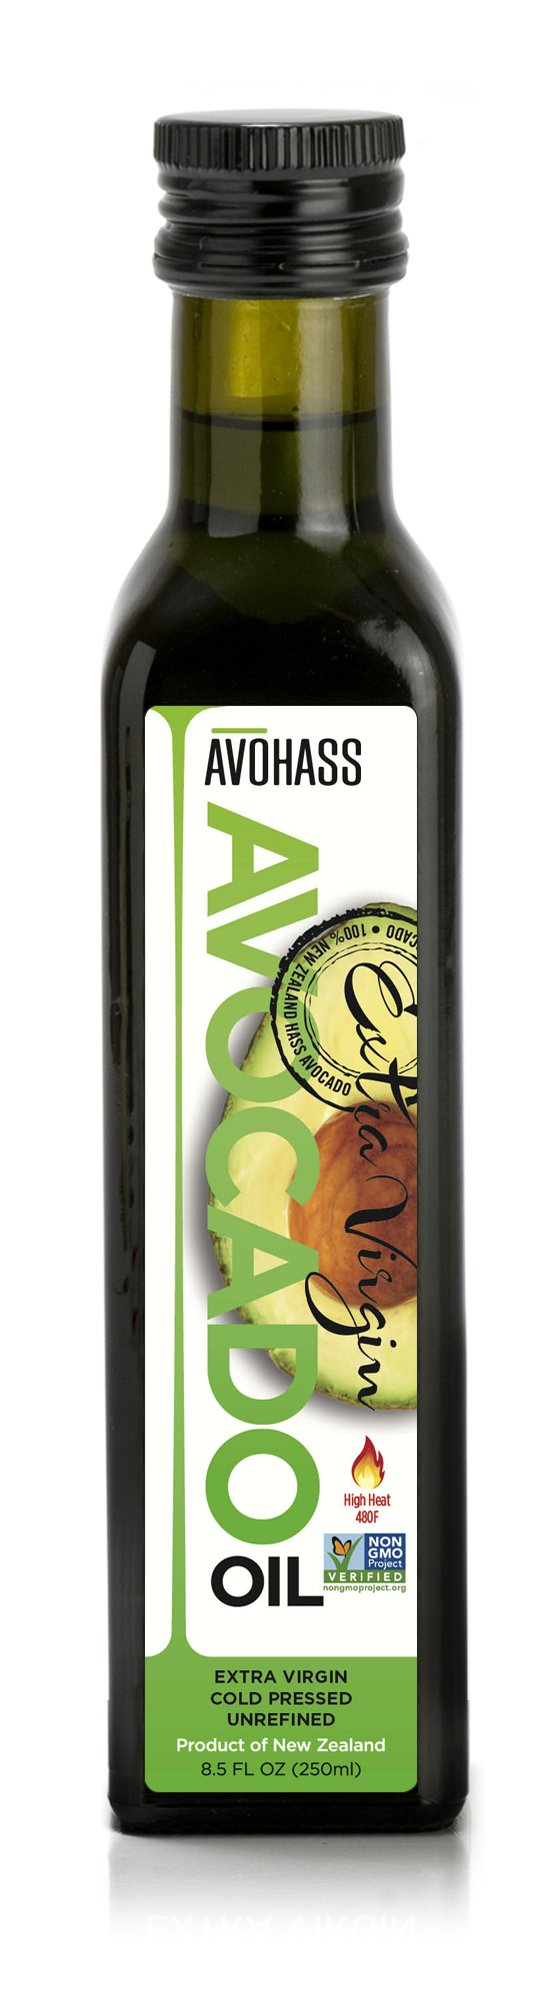 Avohass New Zealand Extra Virgin Avocado Oil 8.5 fl oz